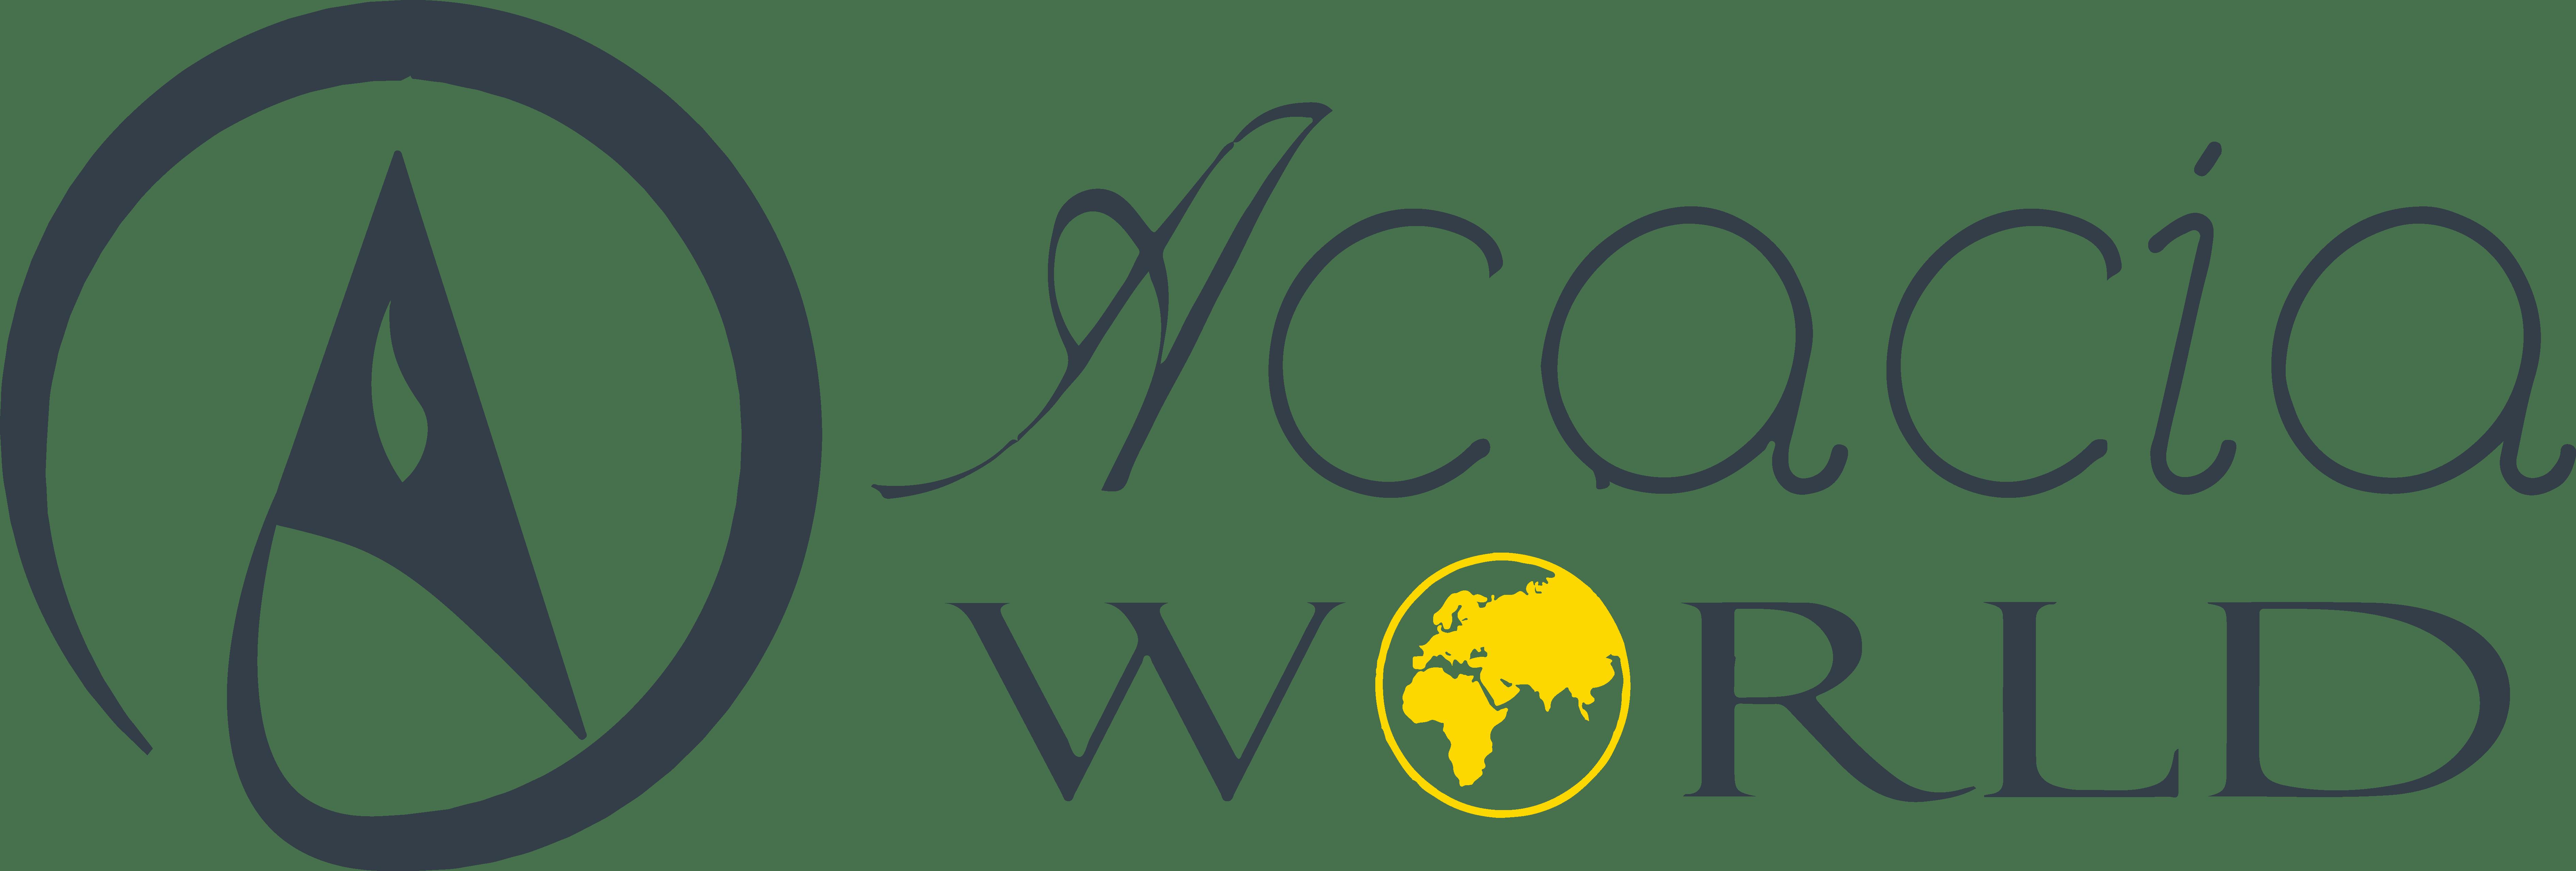 Acacia World